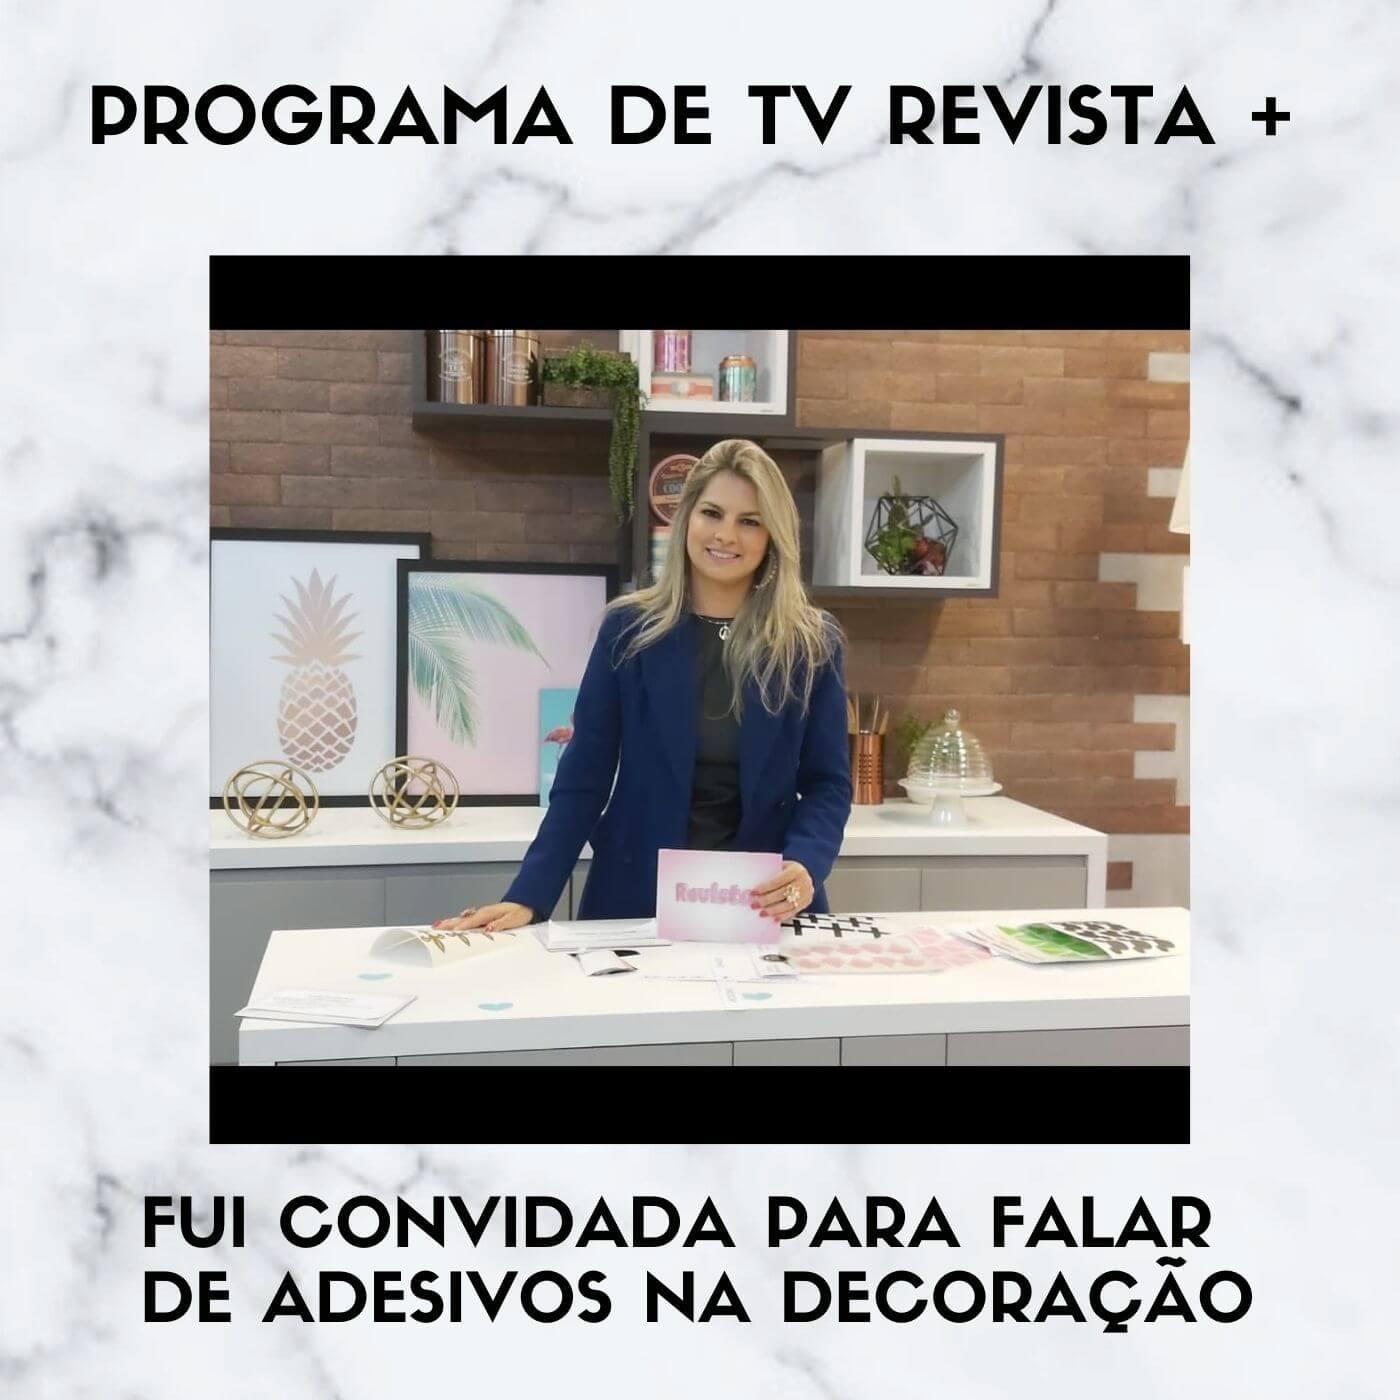 GRATIDÃO PALAVRA ADESIVA